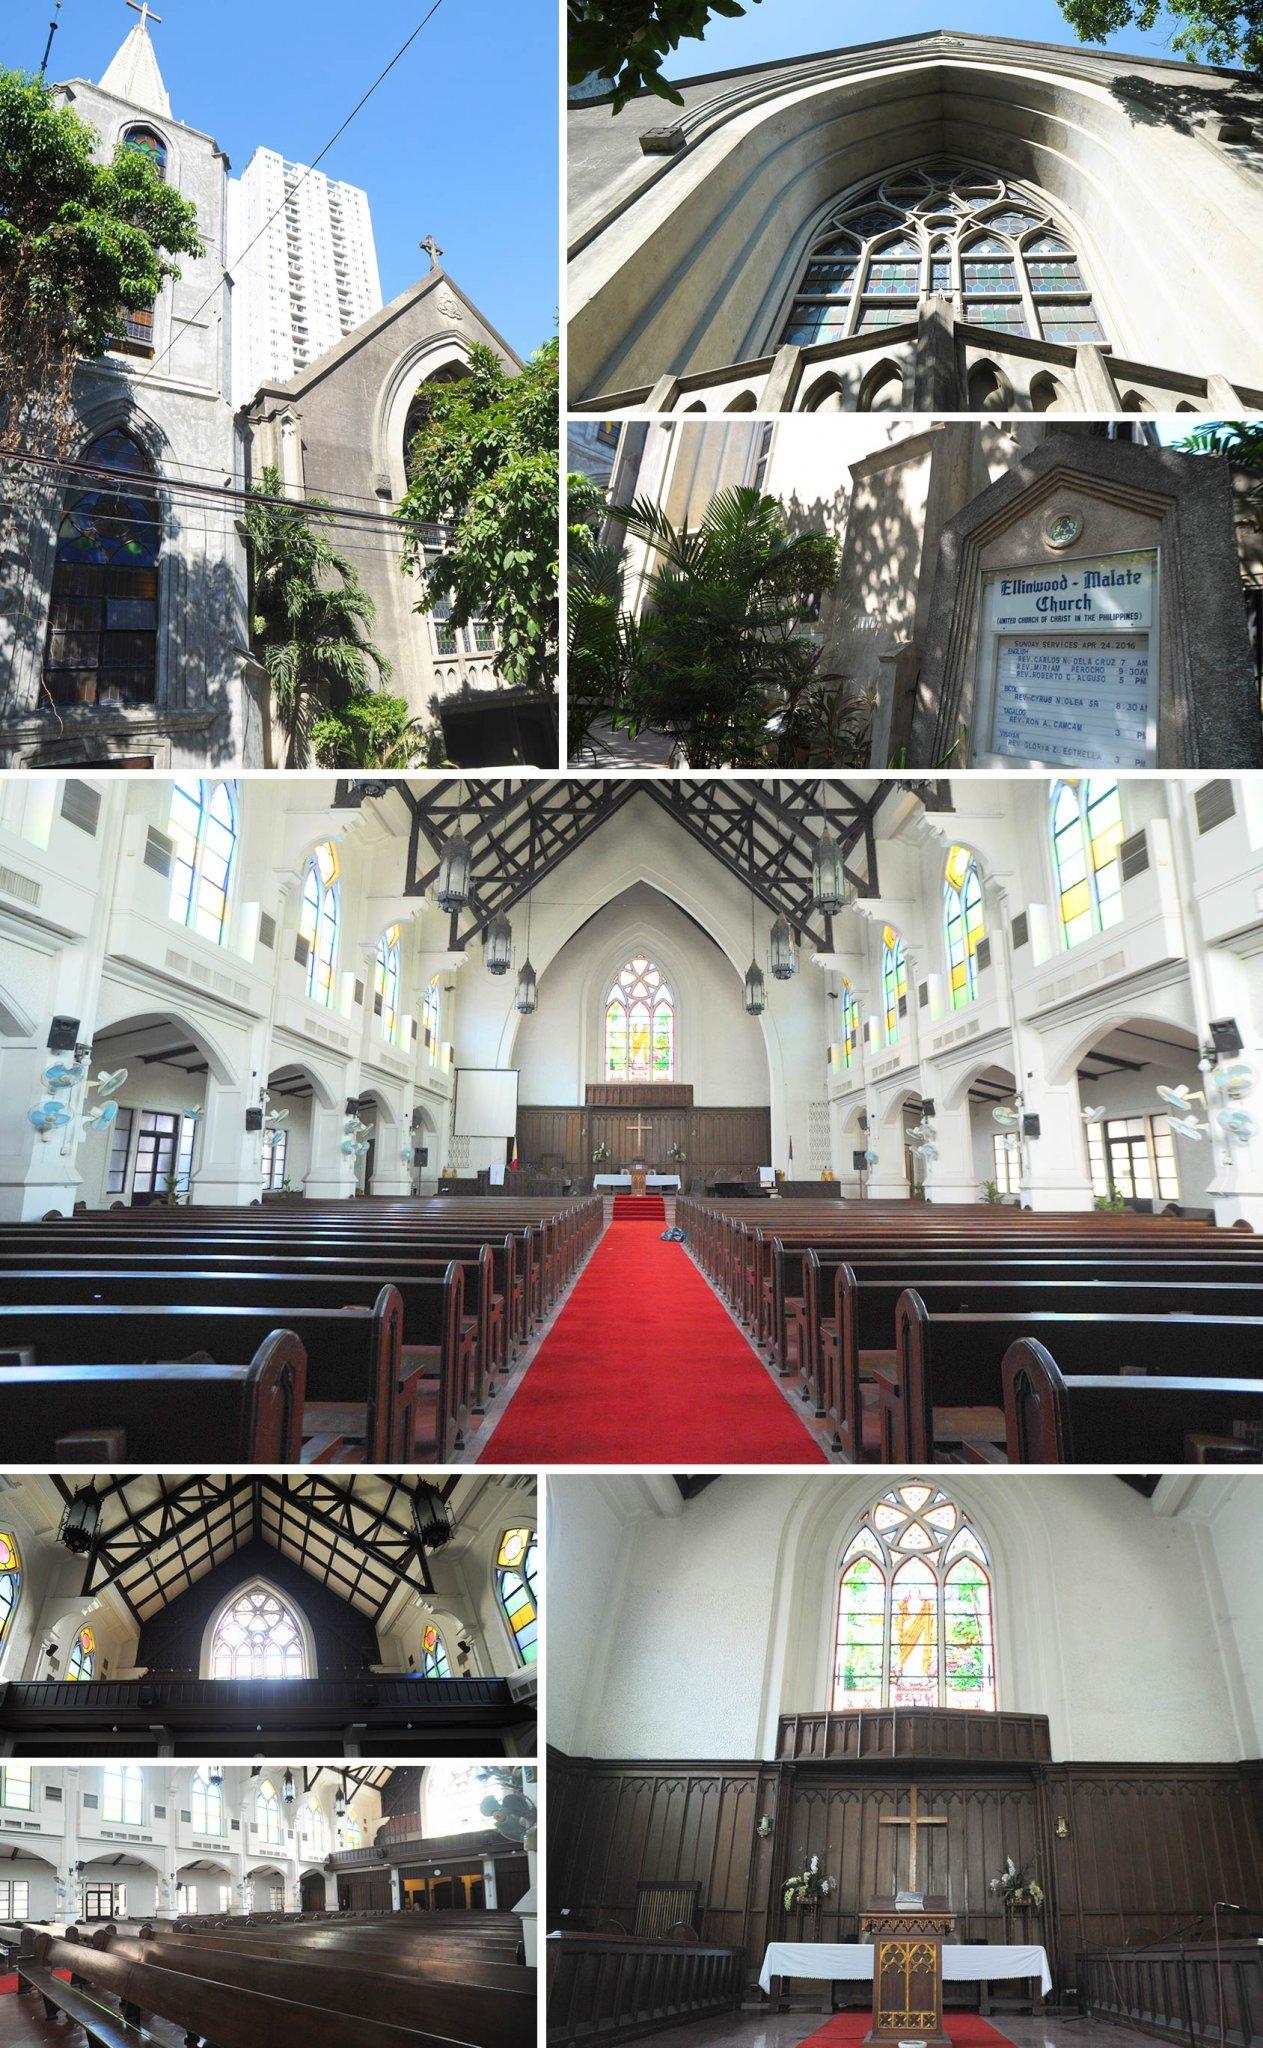 Ellinwood Malate Church